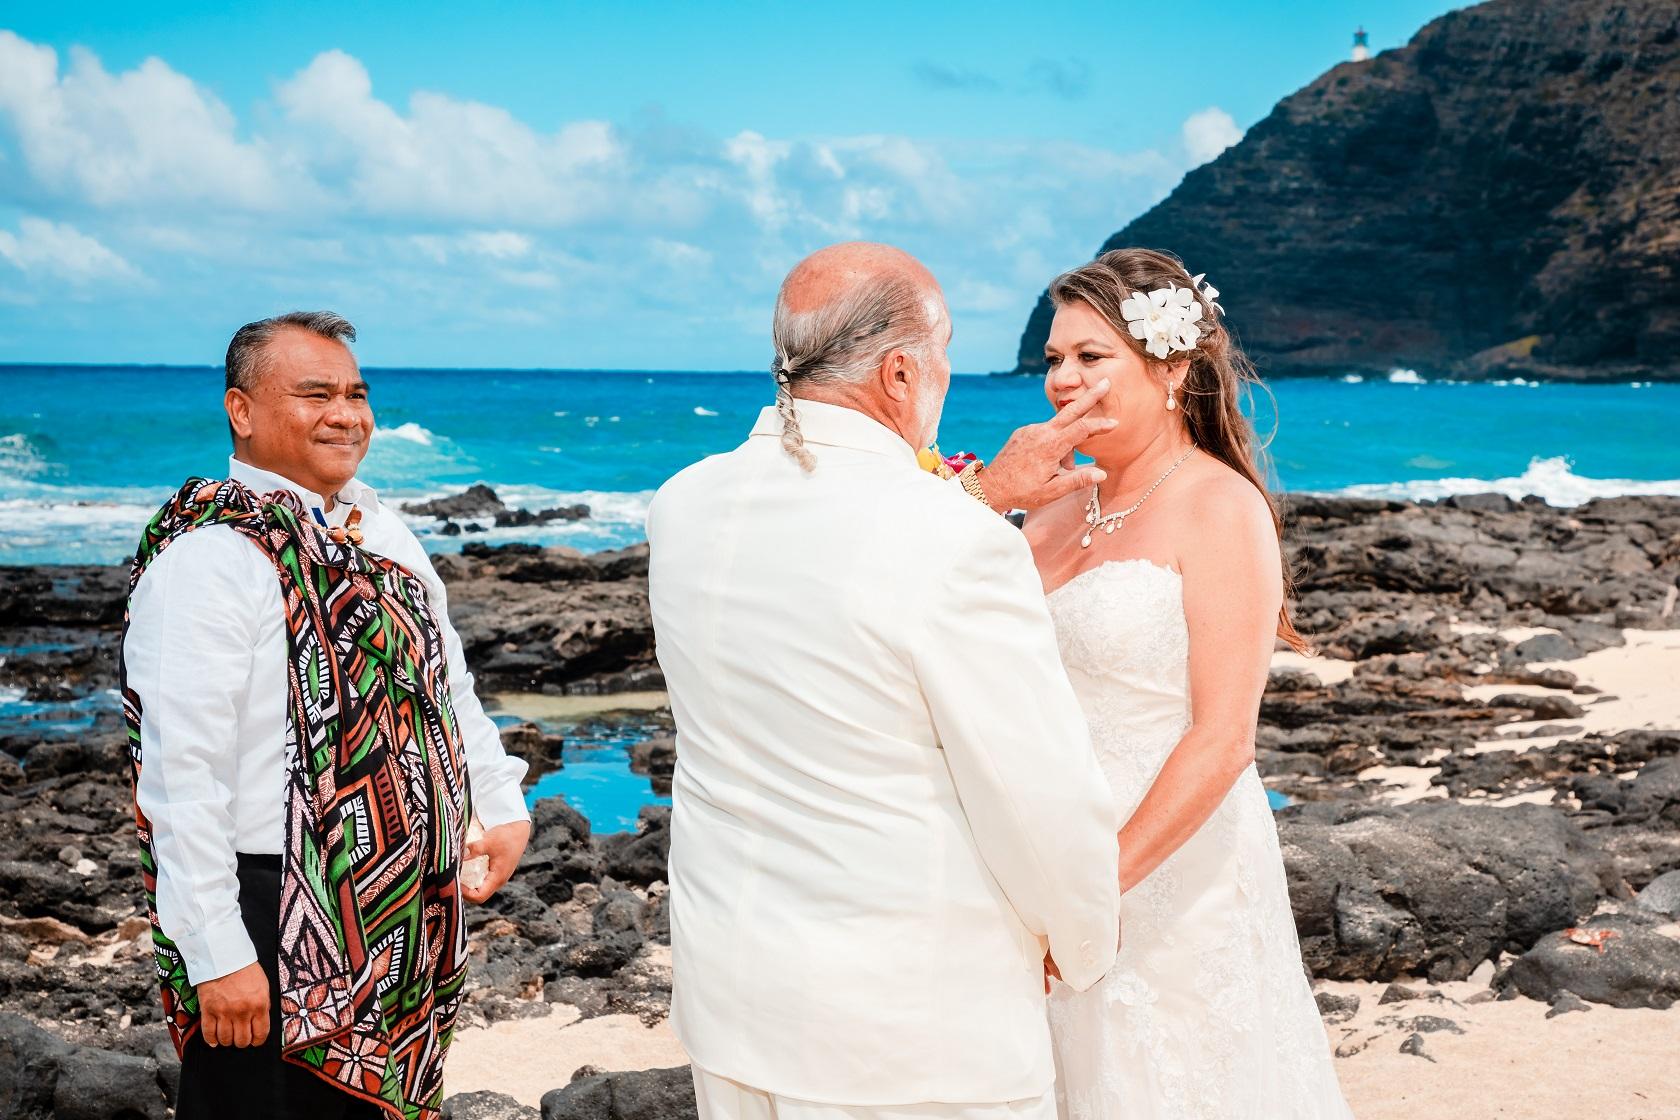 wedding ceremony makapu'u beach oahu hawaii